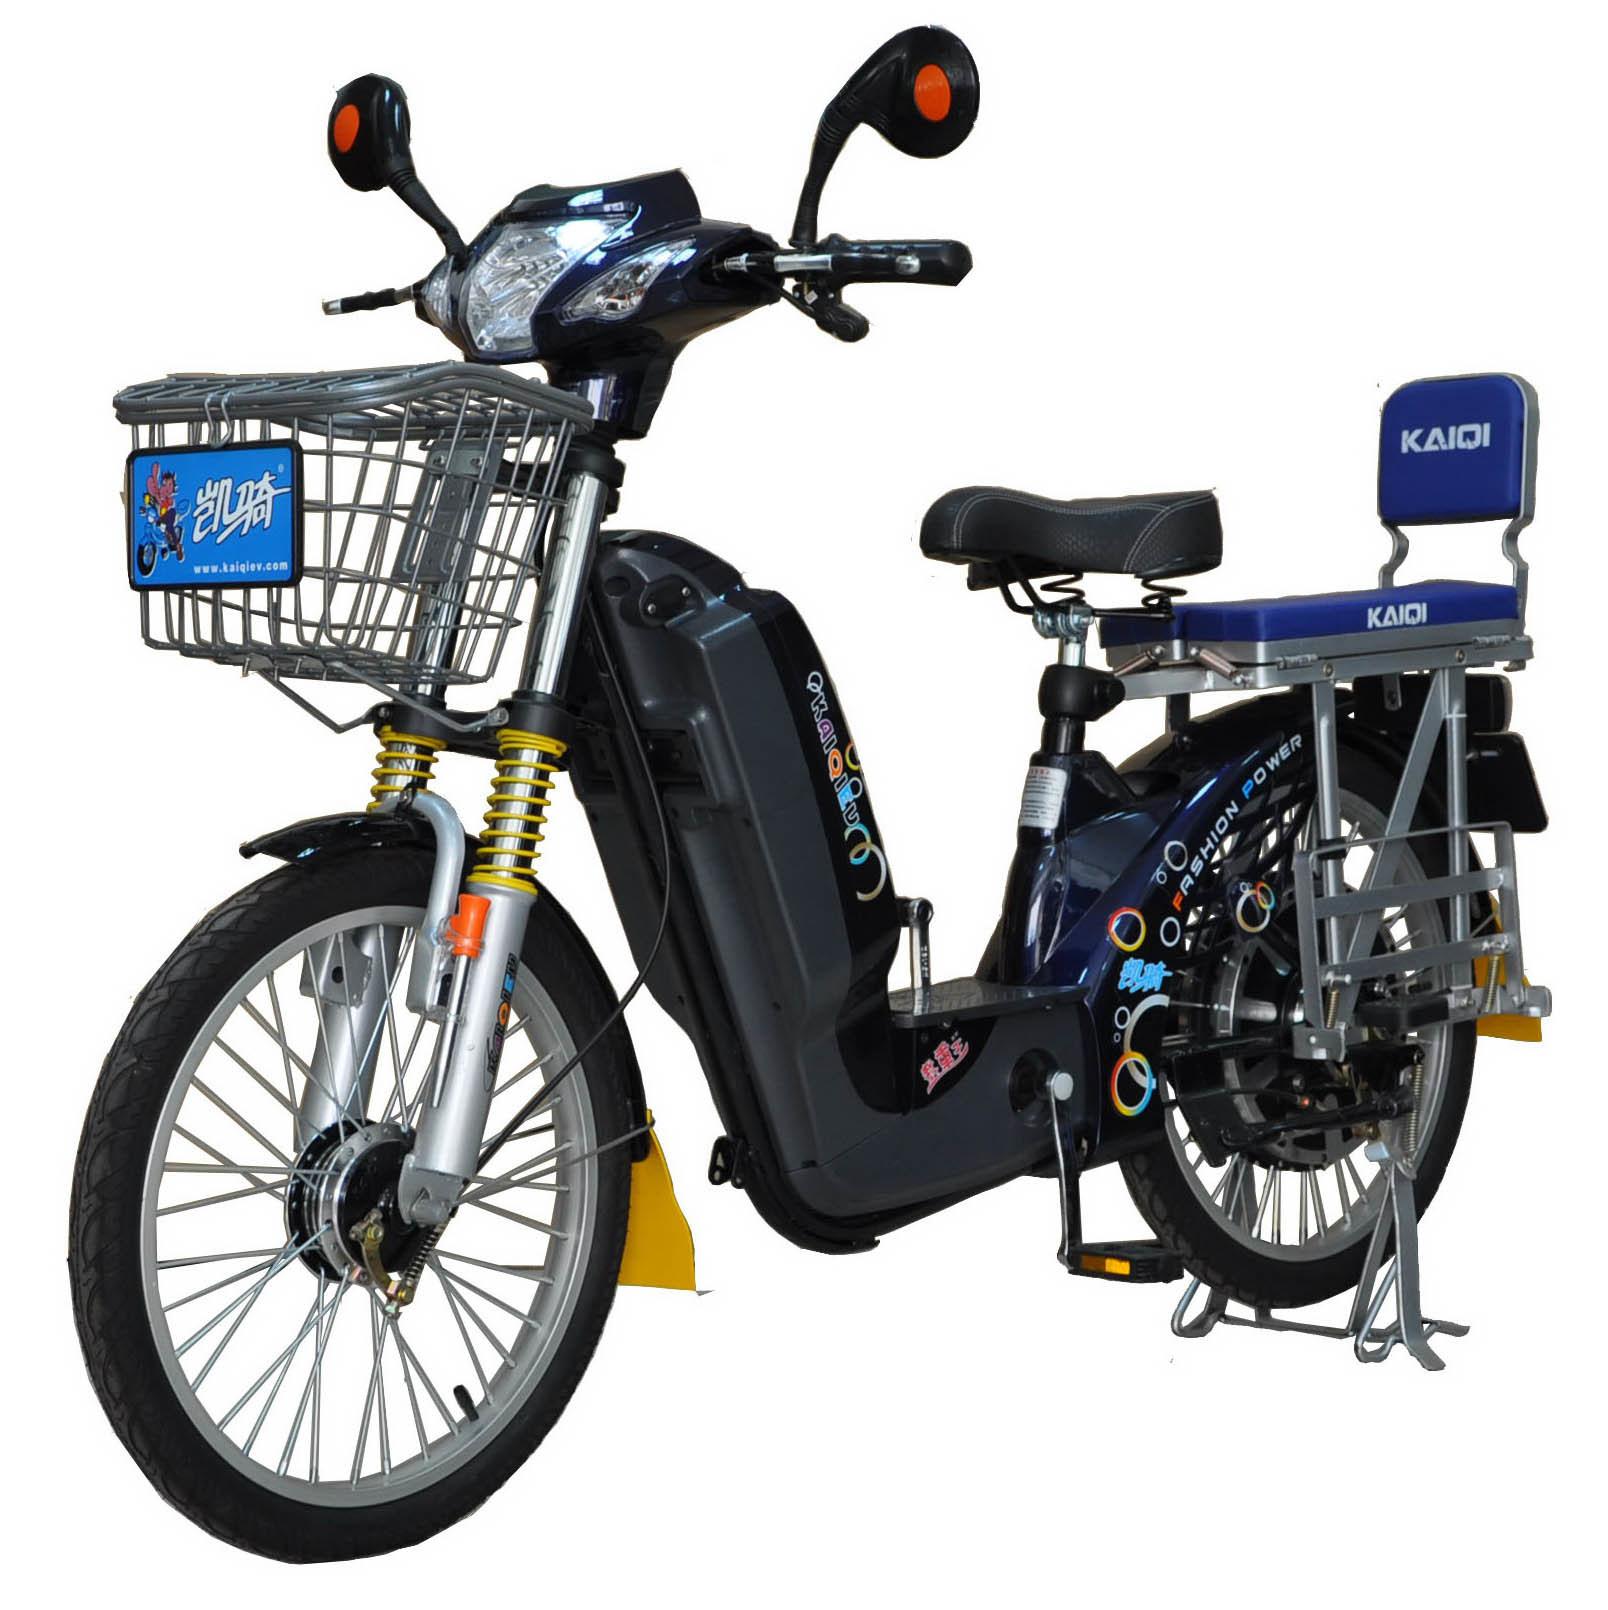 bicicletta bici motorino elettrici tdla380 7z